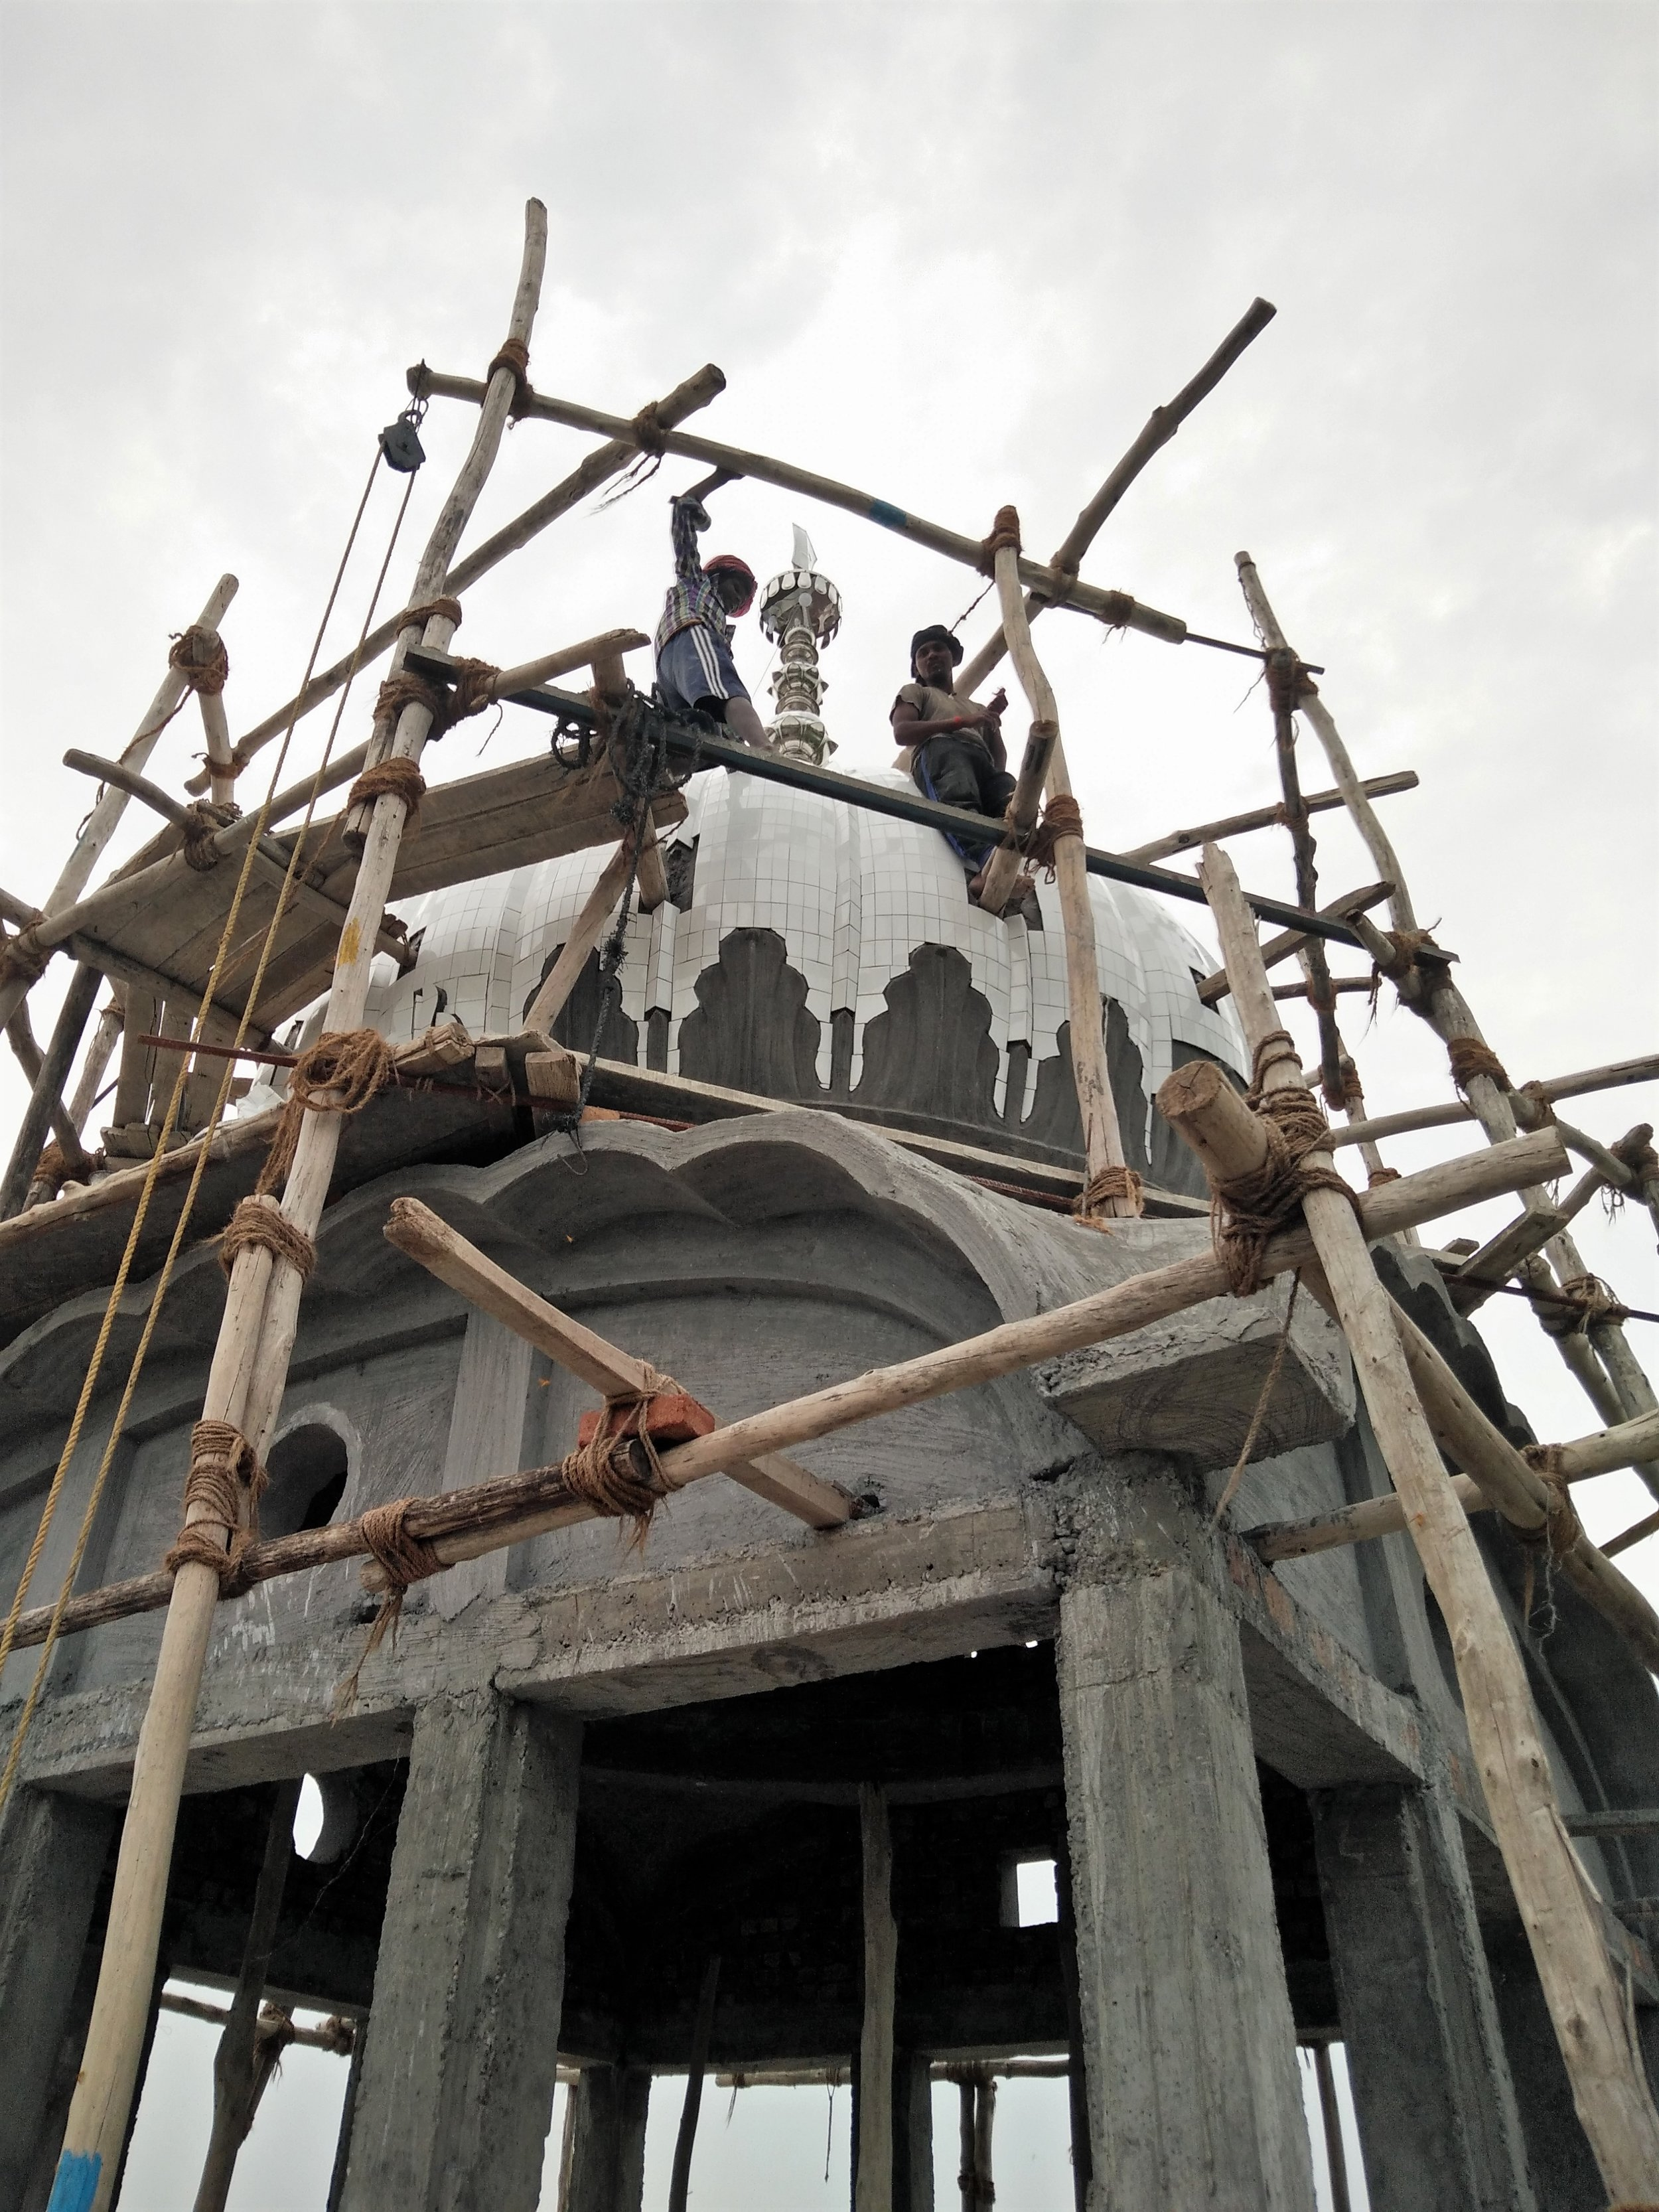 Migrant workers build Gurudwara dome. Credit: Ankur Jayaswal